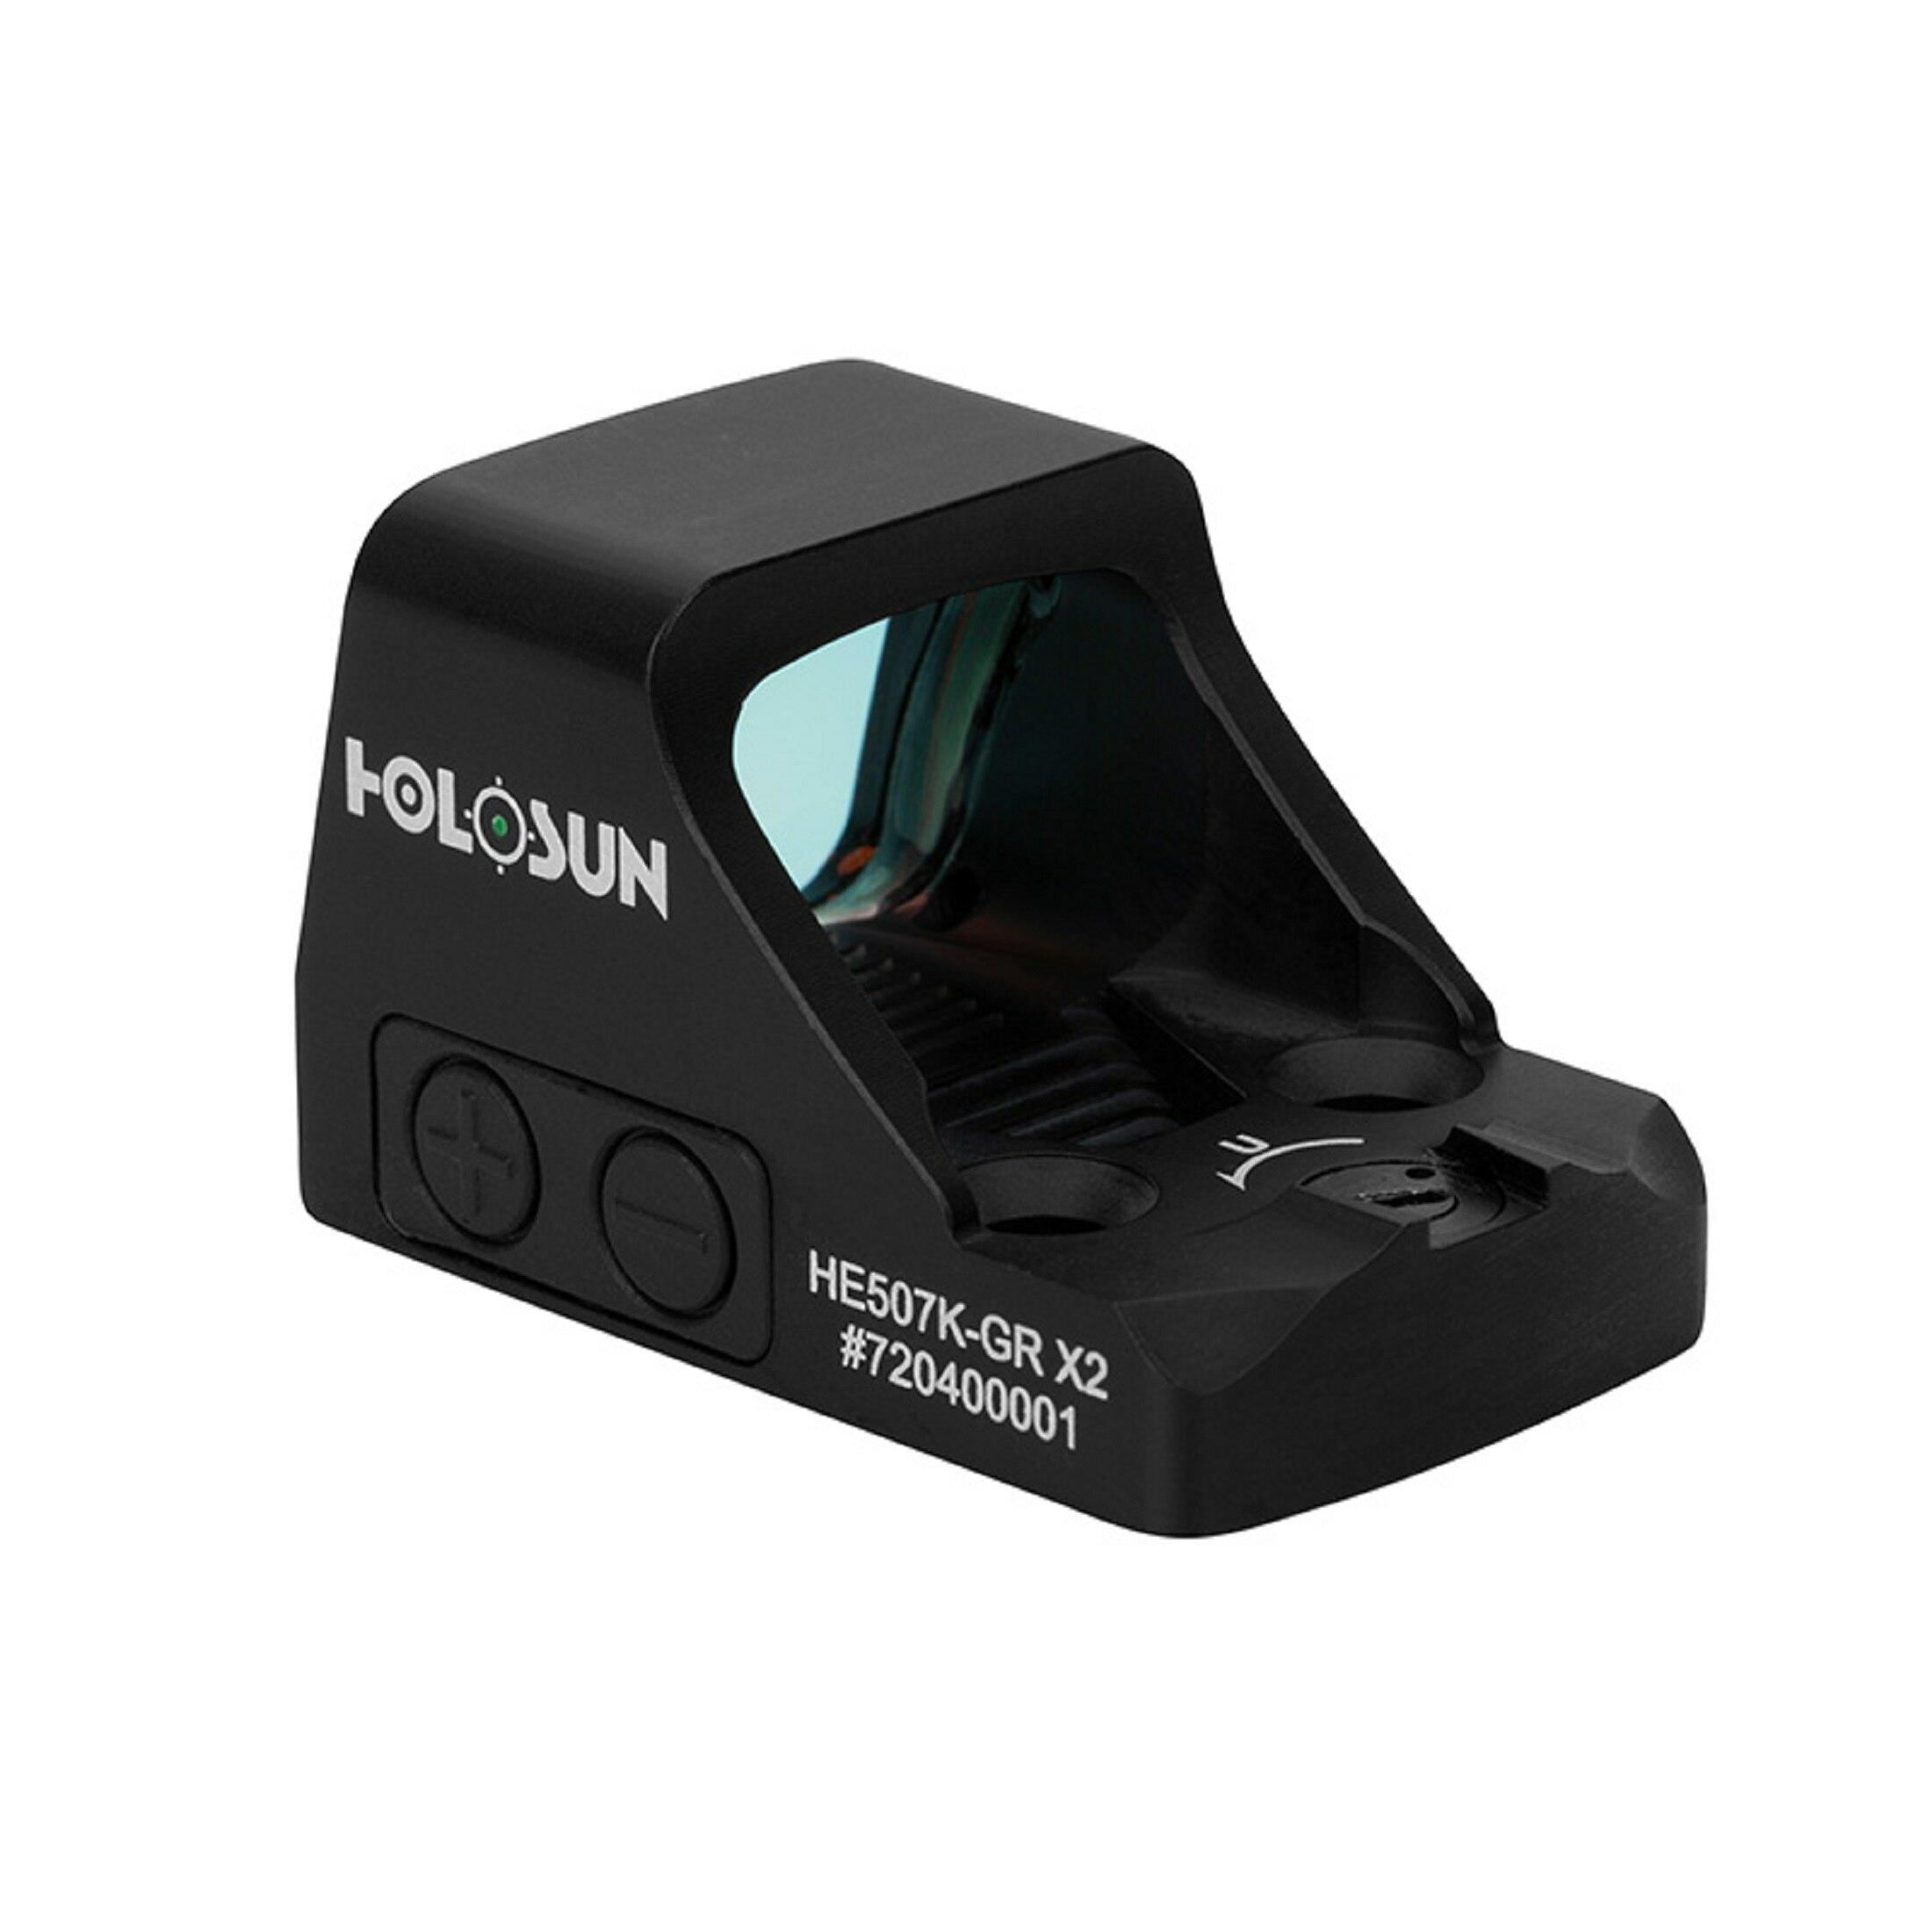 Holosun Dot Sight CLASSIC HE507K-GR-X2